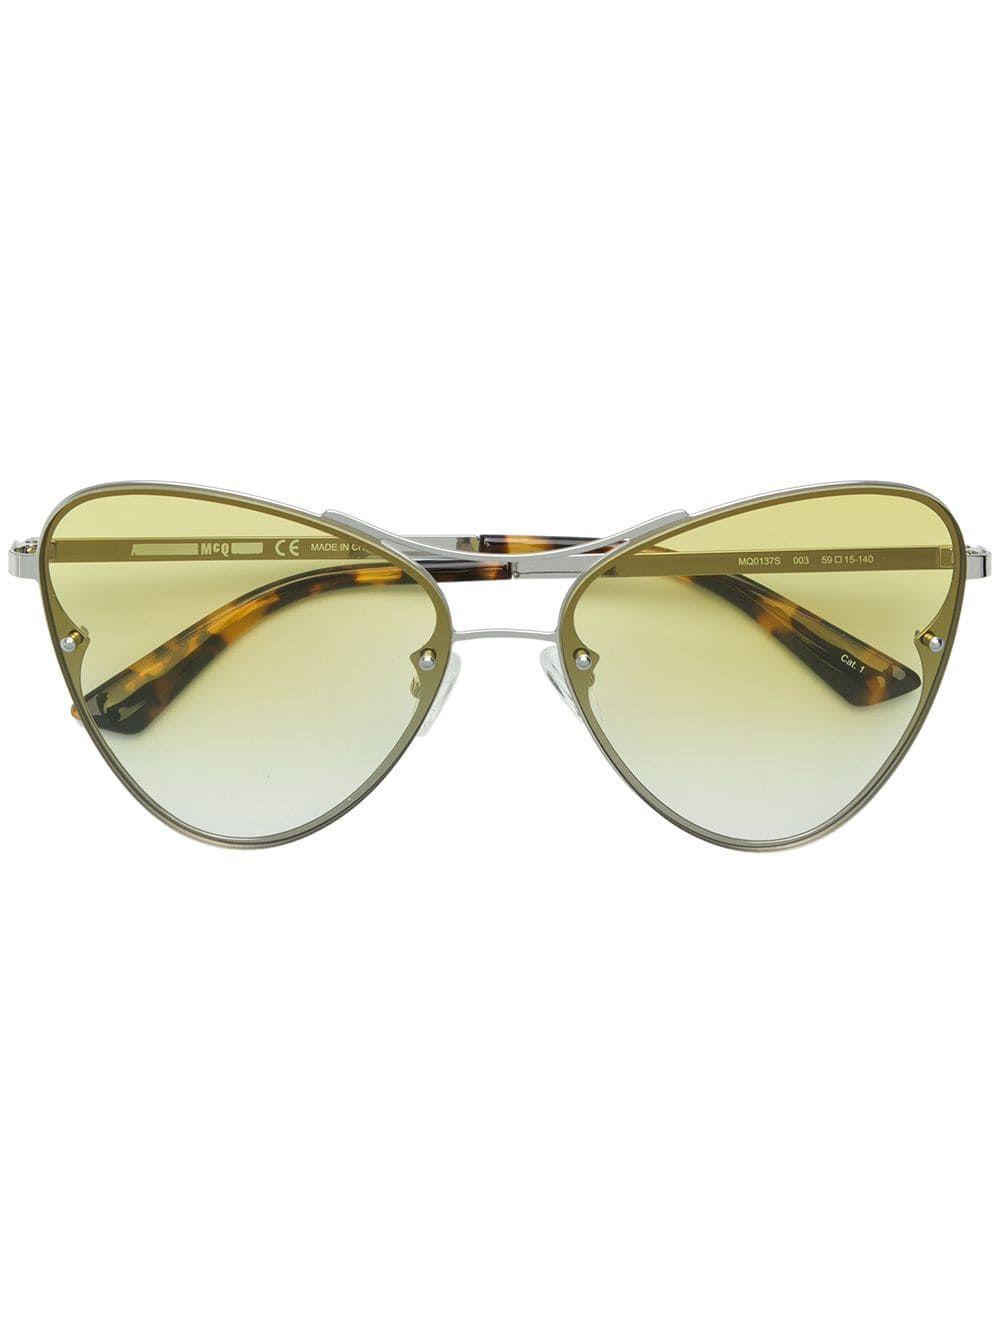 McQ Alexander McQueen Oversized Gradient Sunglasses – Farfetch